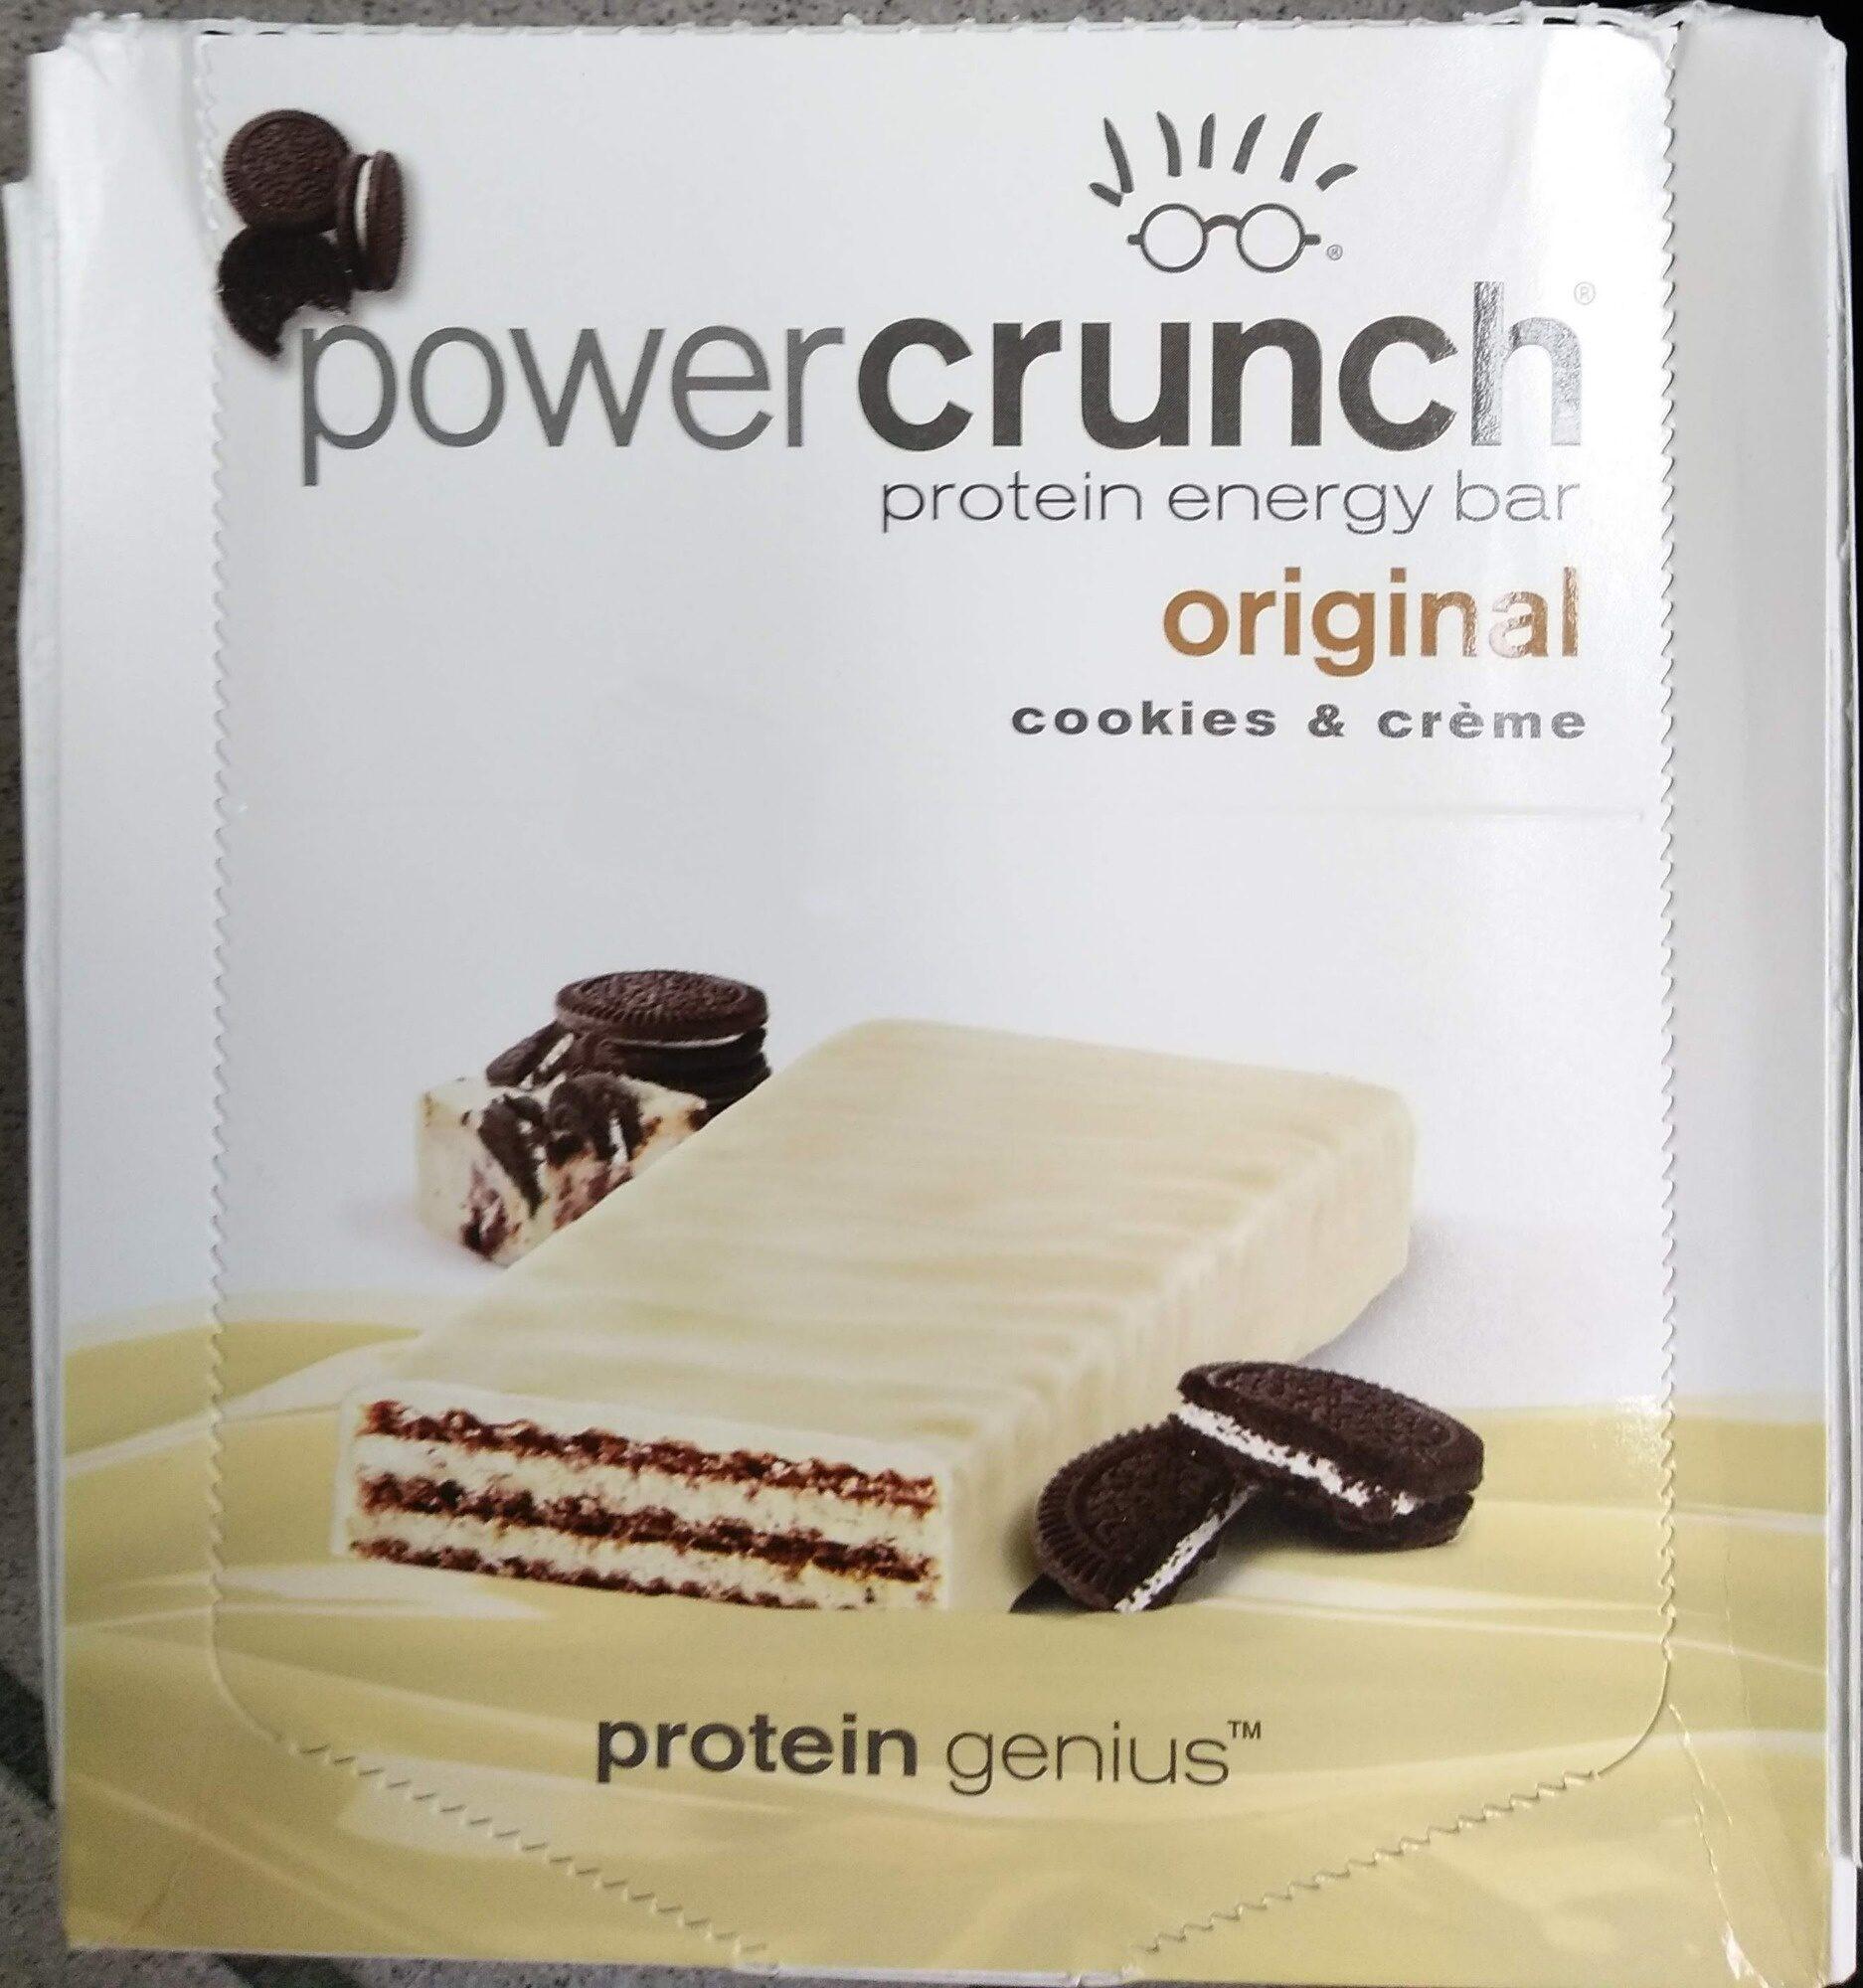 Original cookies & creme protein energy bar - Product - en